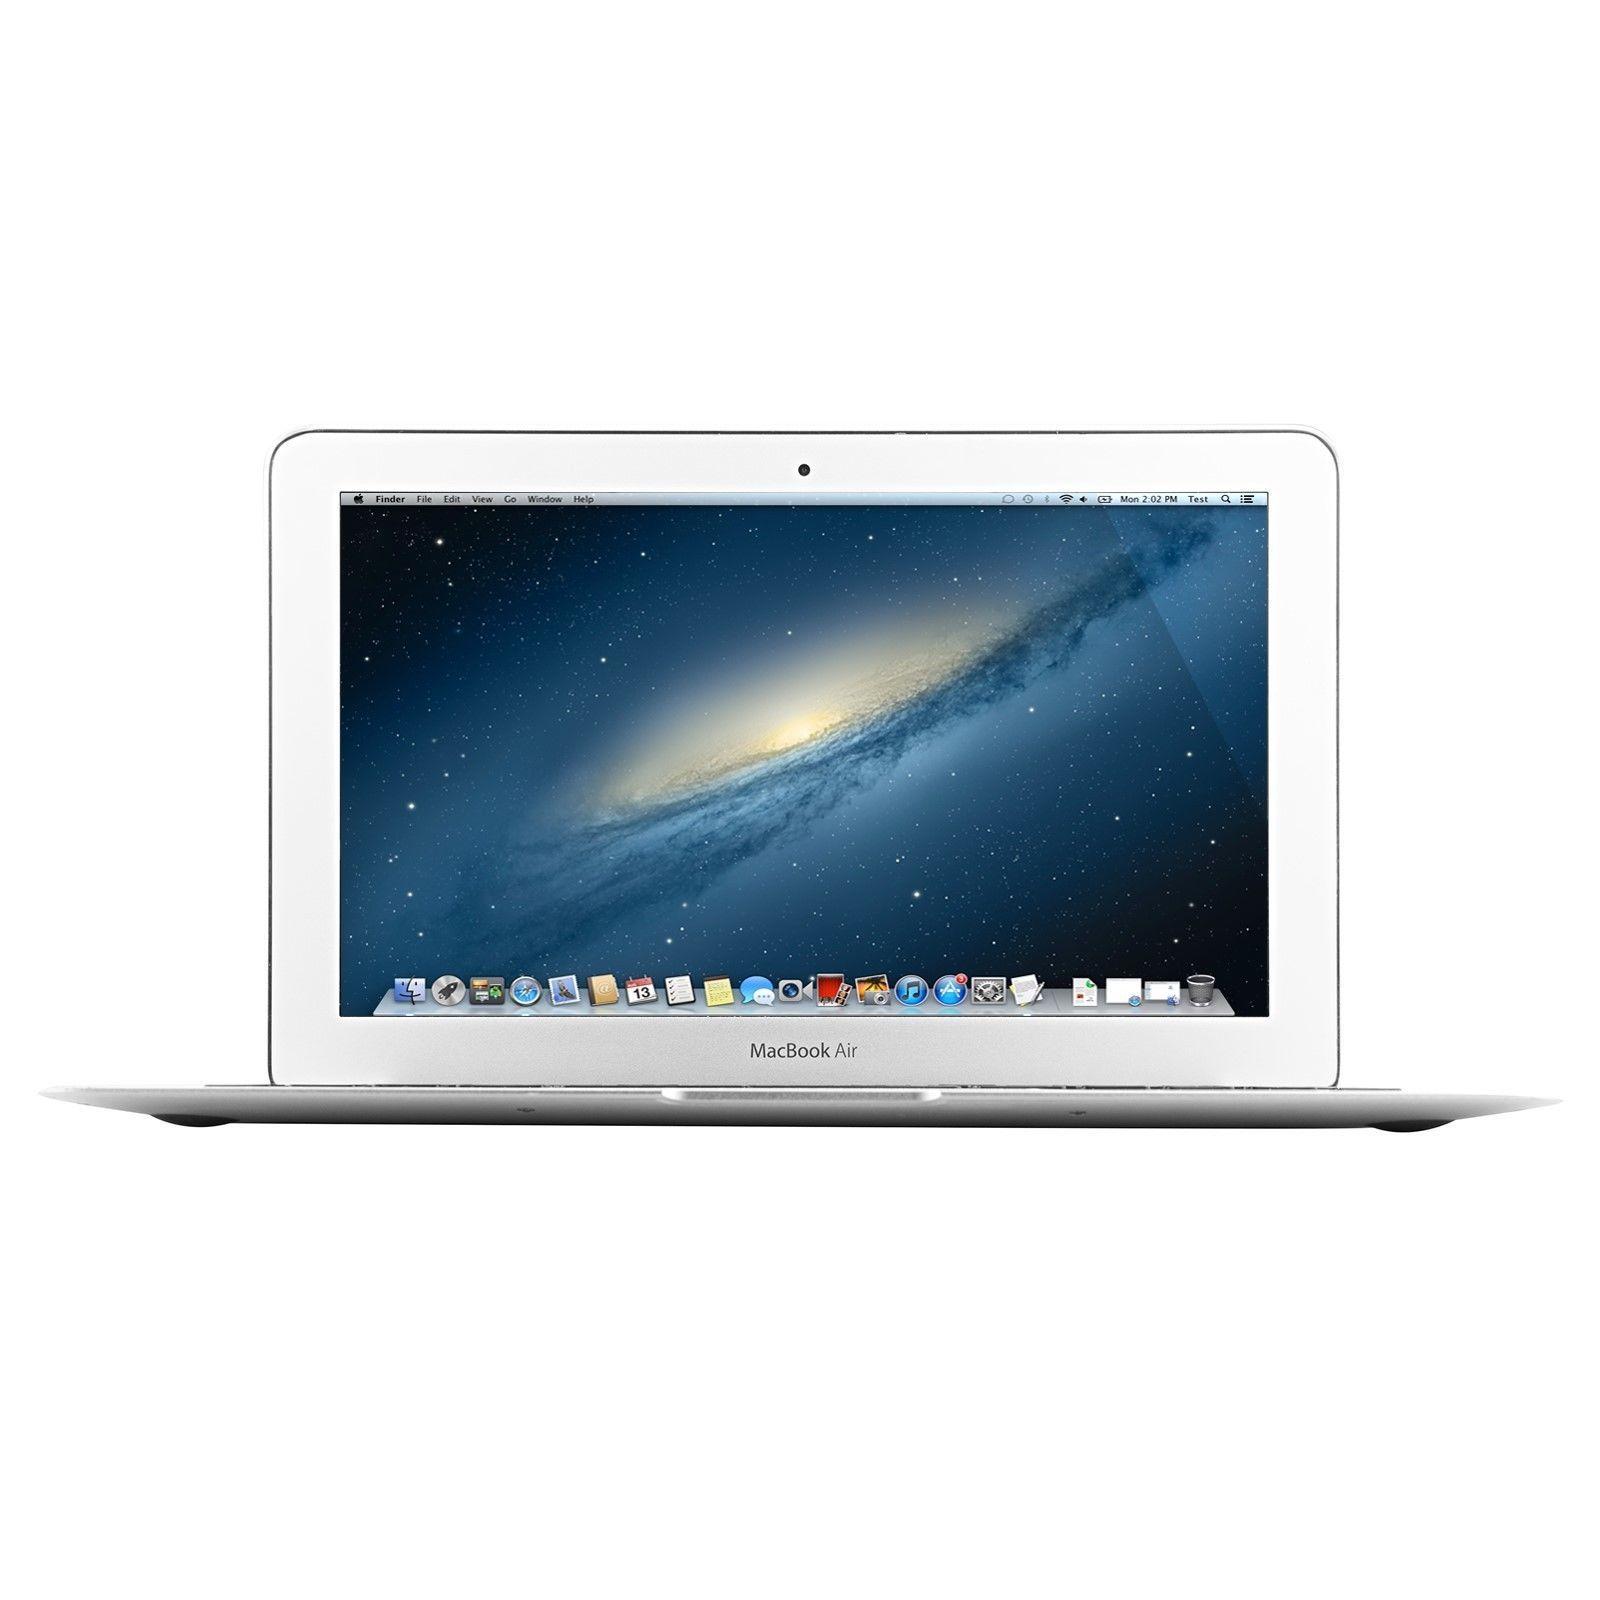 "Apple Macbook Air 11.6"" 1.3 GHz Core i5 128 GB SSD, 4GB"